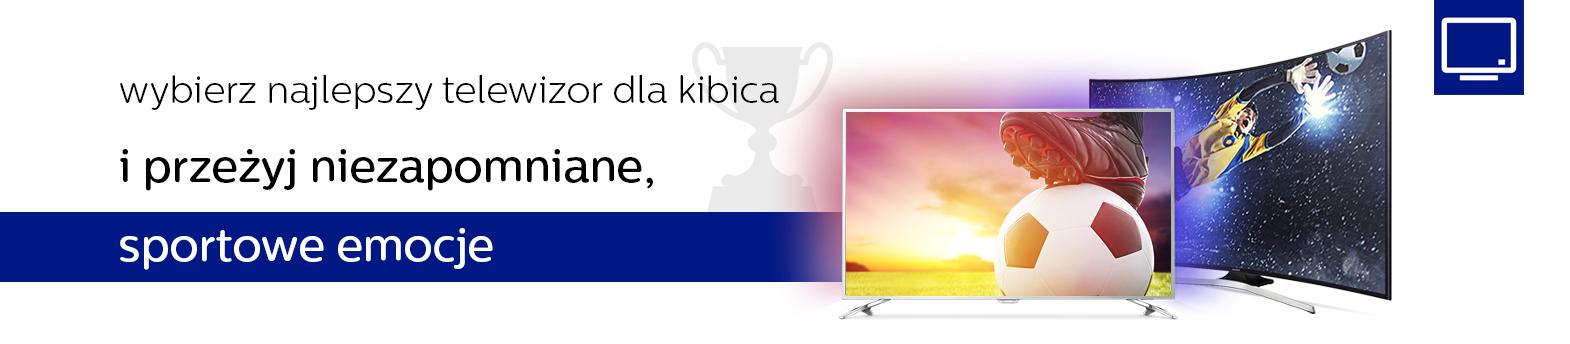 TV dla kibica